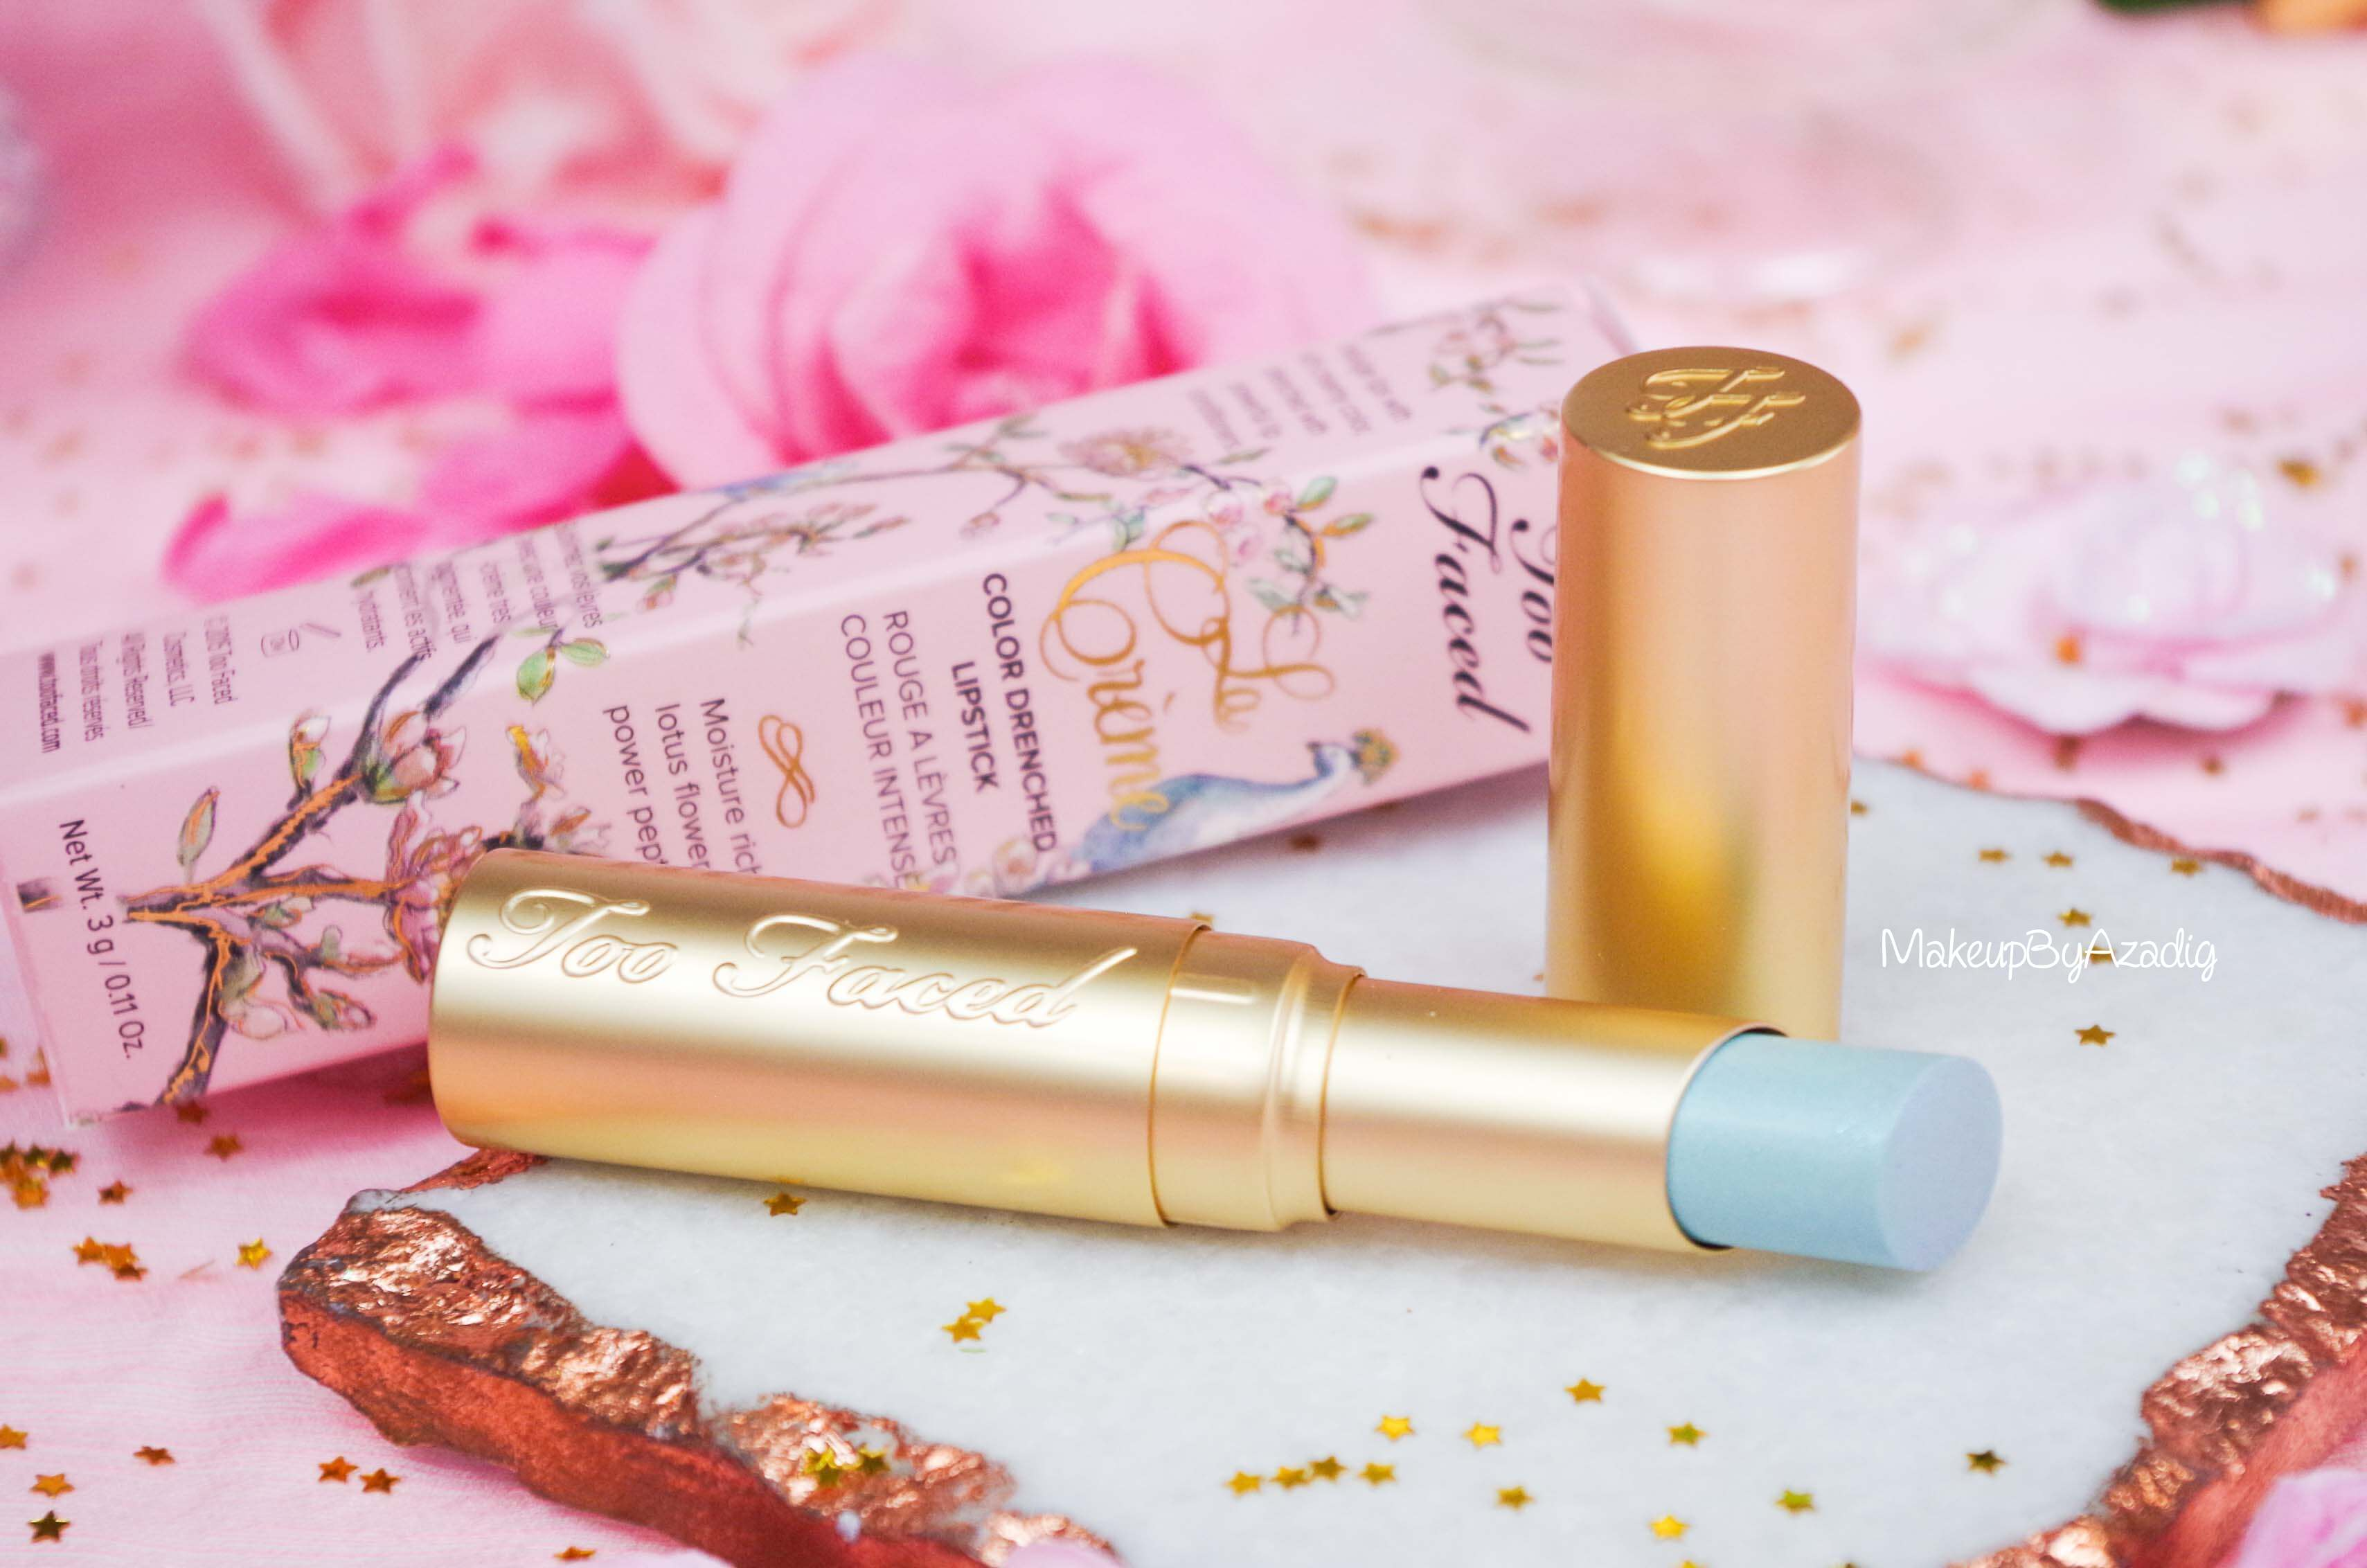 rouge-levres-creme-too-faced-unicorn-tears-magique-makeupbyazadig-swatch-avis-prix-revue-sephora-cream